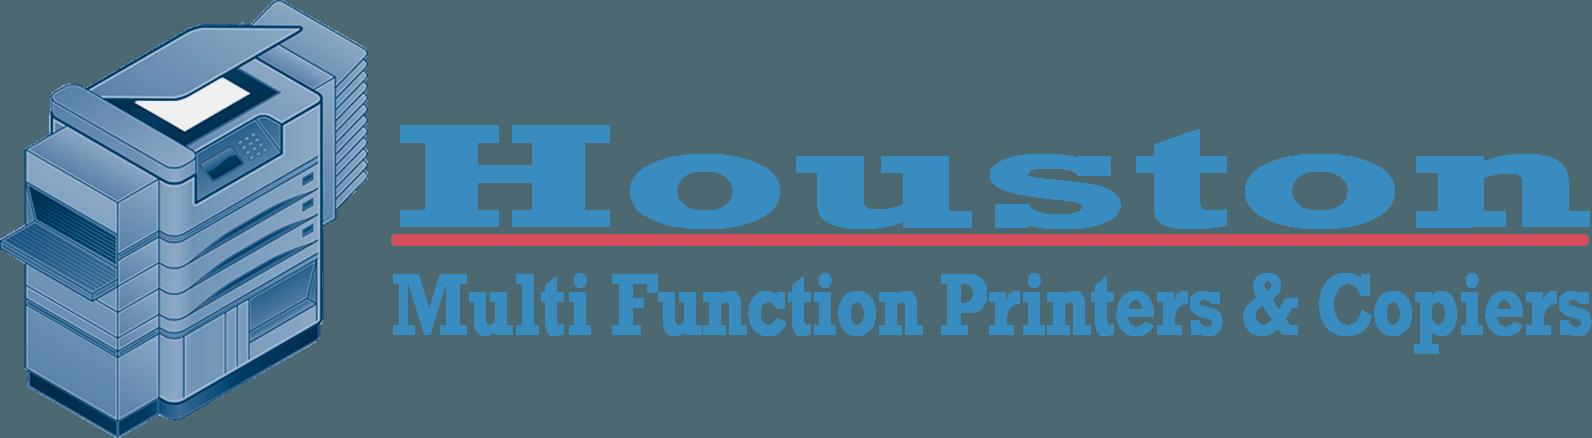 Houston Multi-Function Printers & Copiers – Sales, Service & Leasing